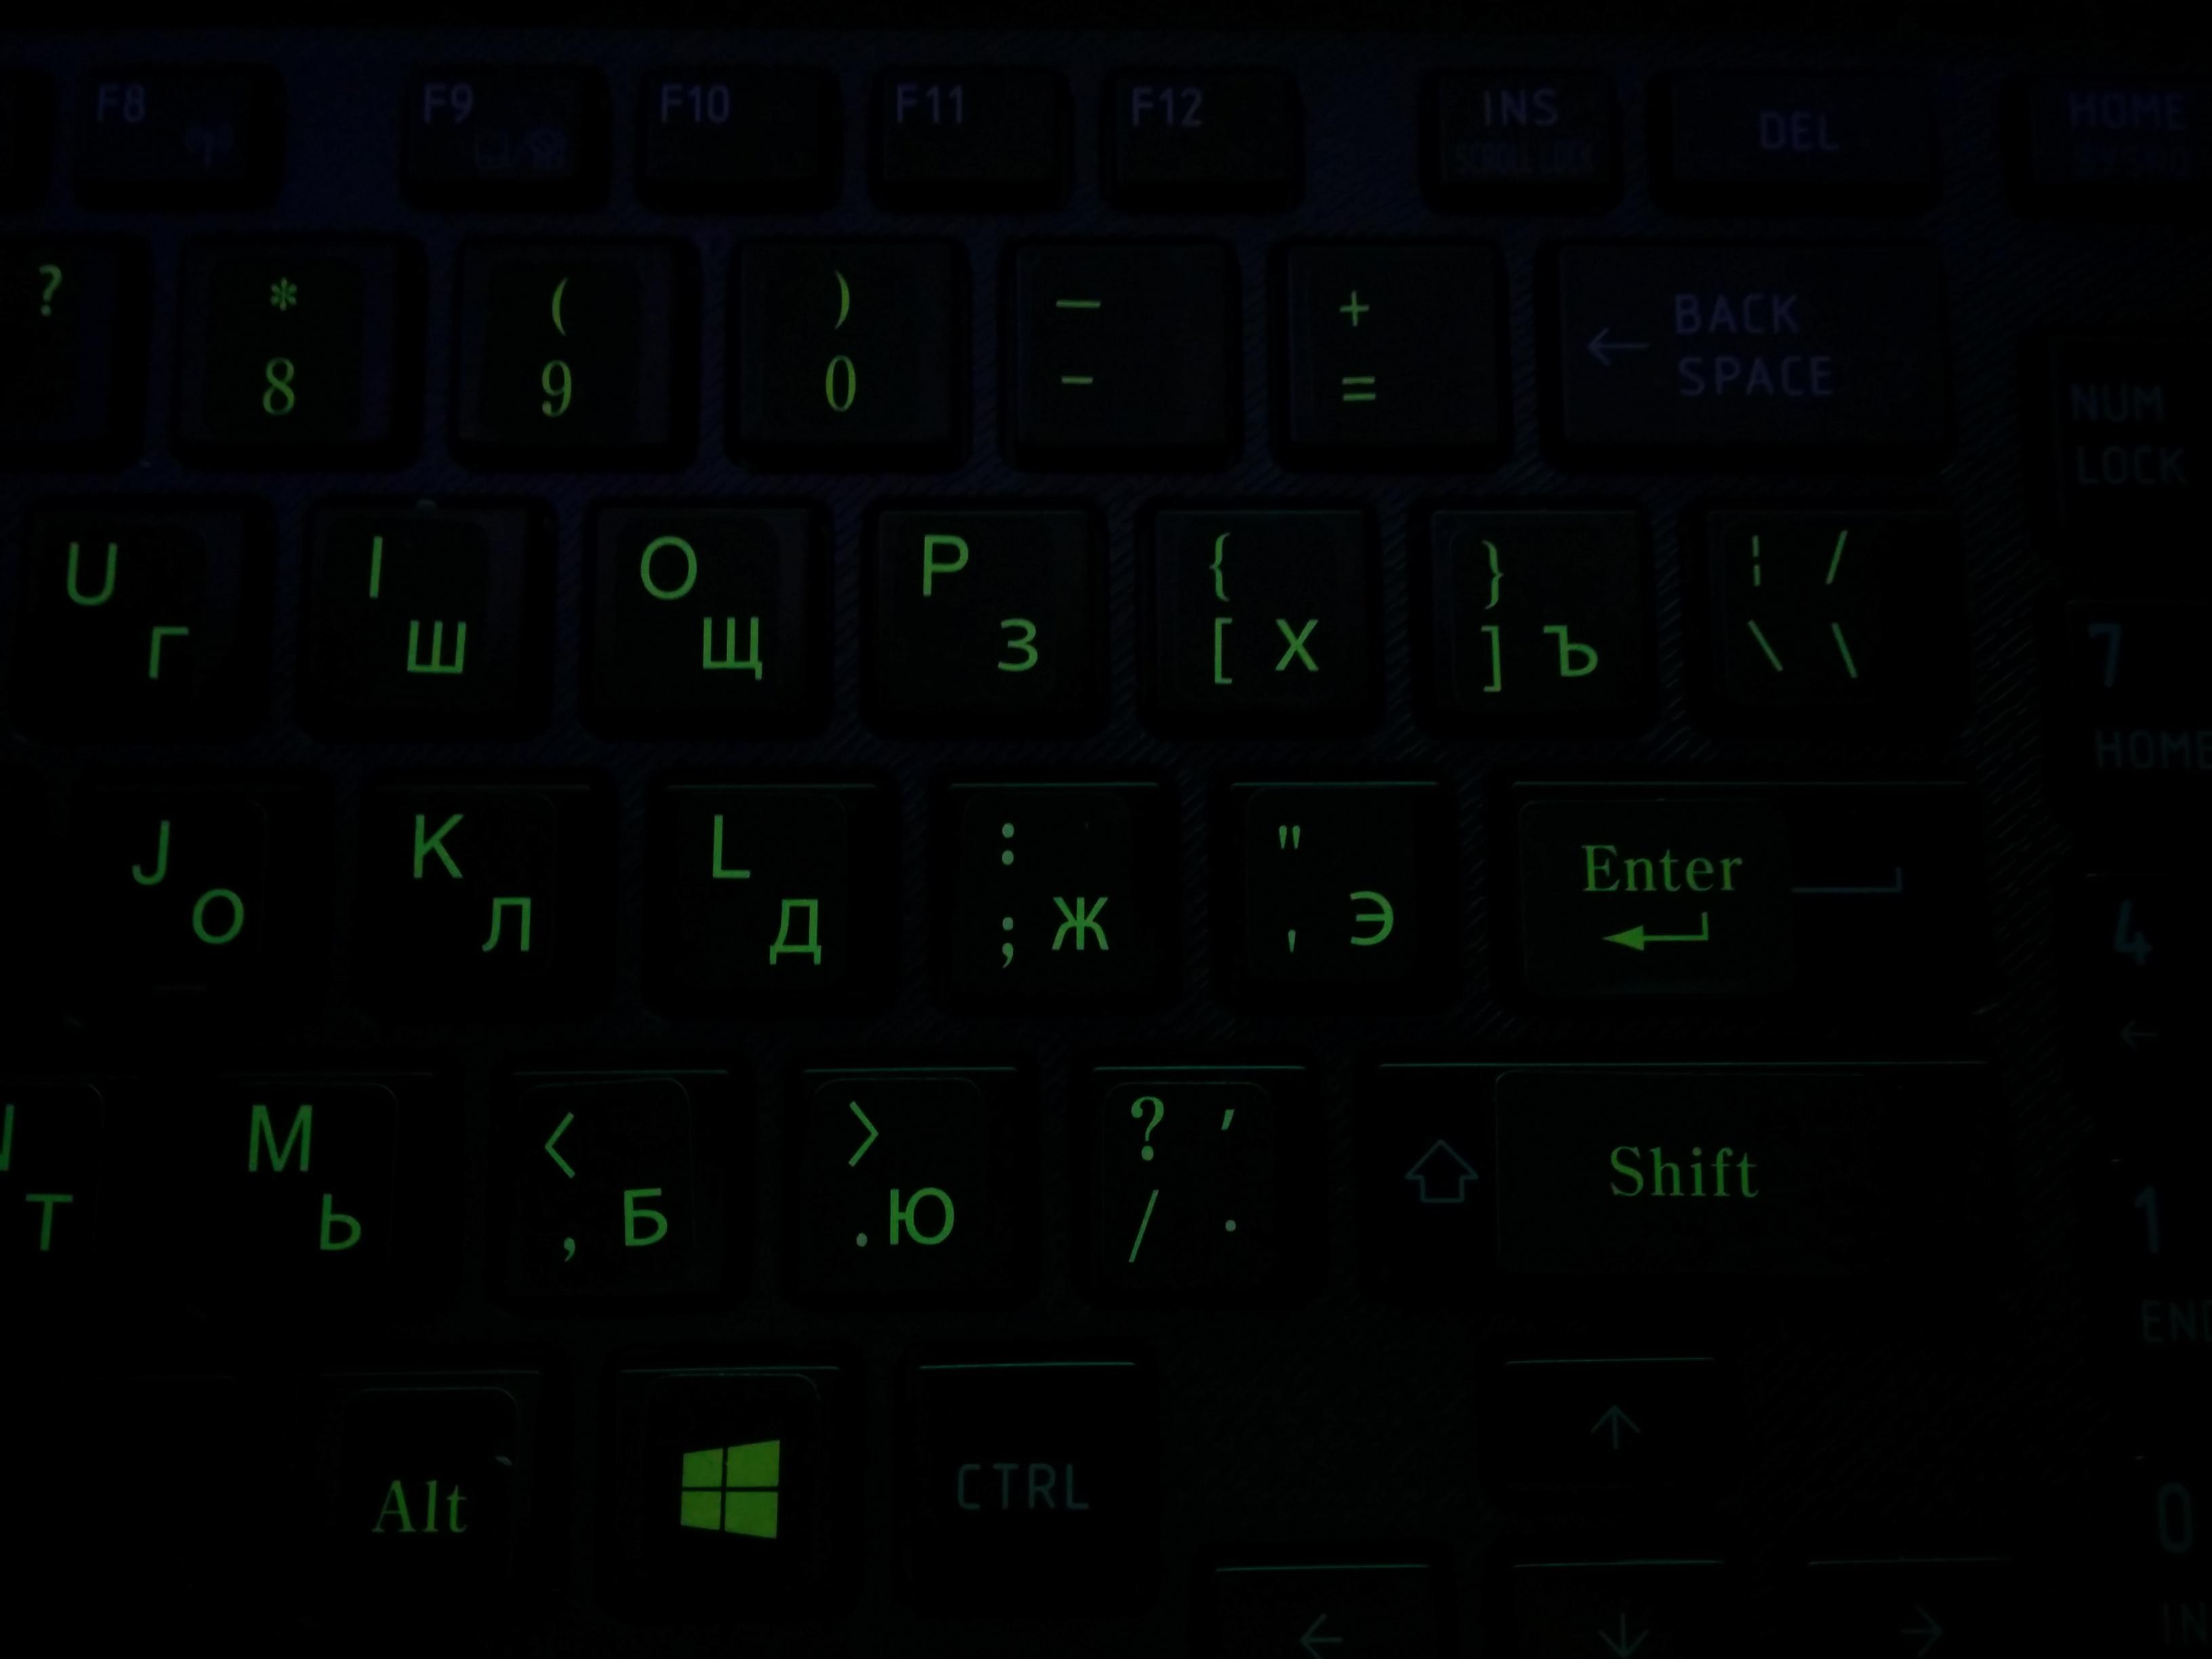 Korean Fluorescent Keyboard Sticker Printed In Korea 형광 스티커!